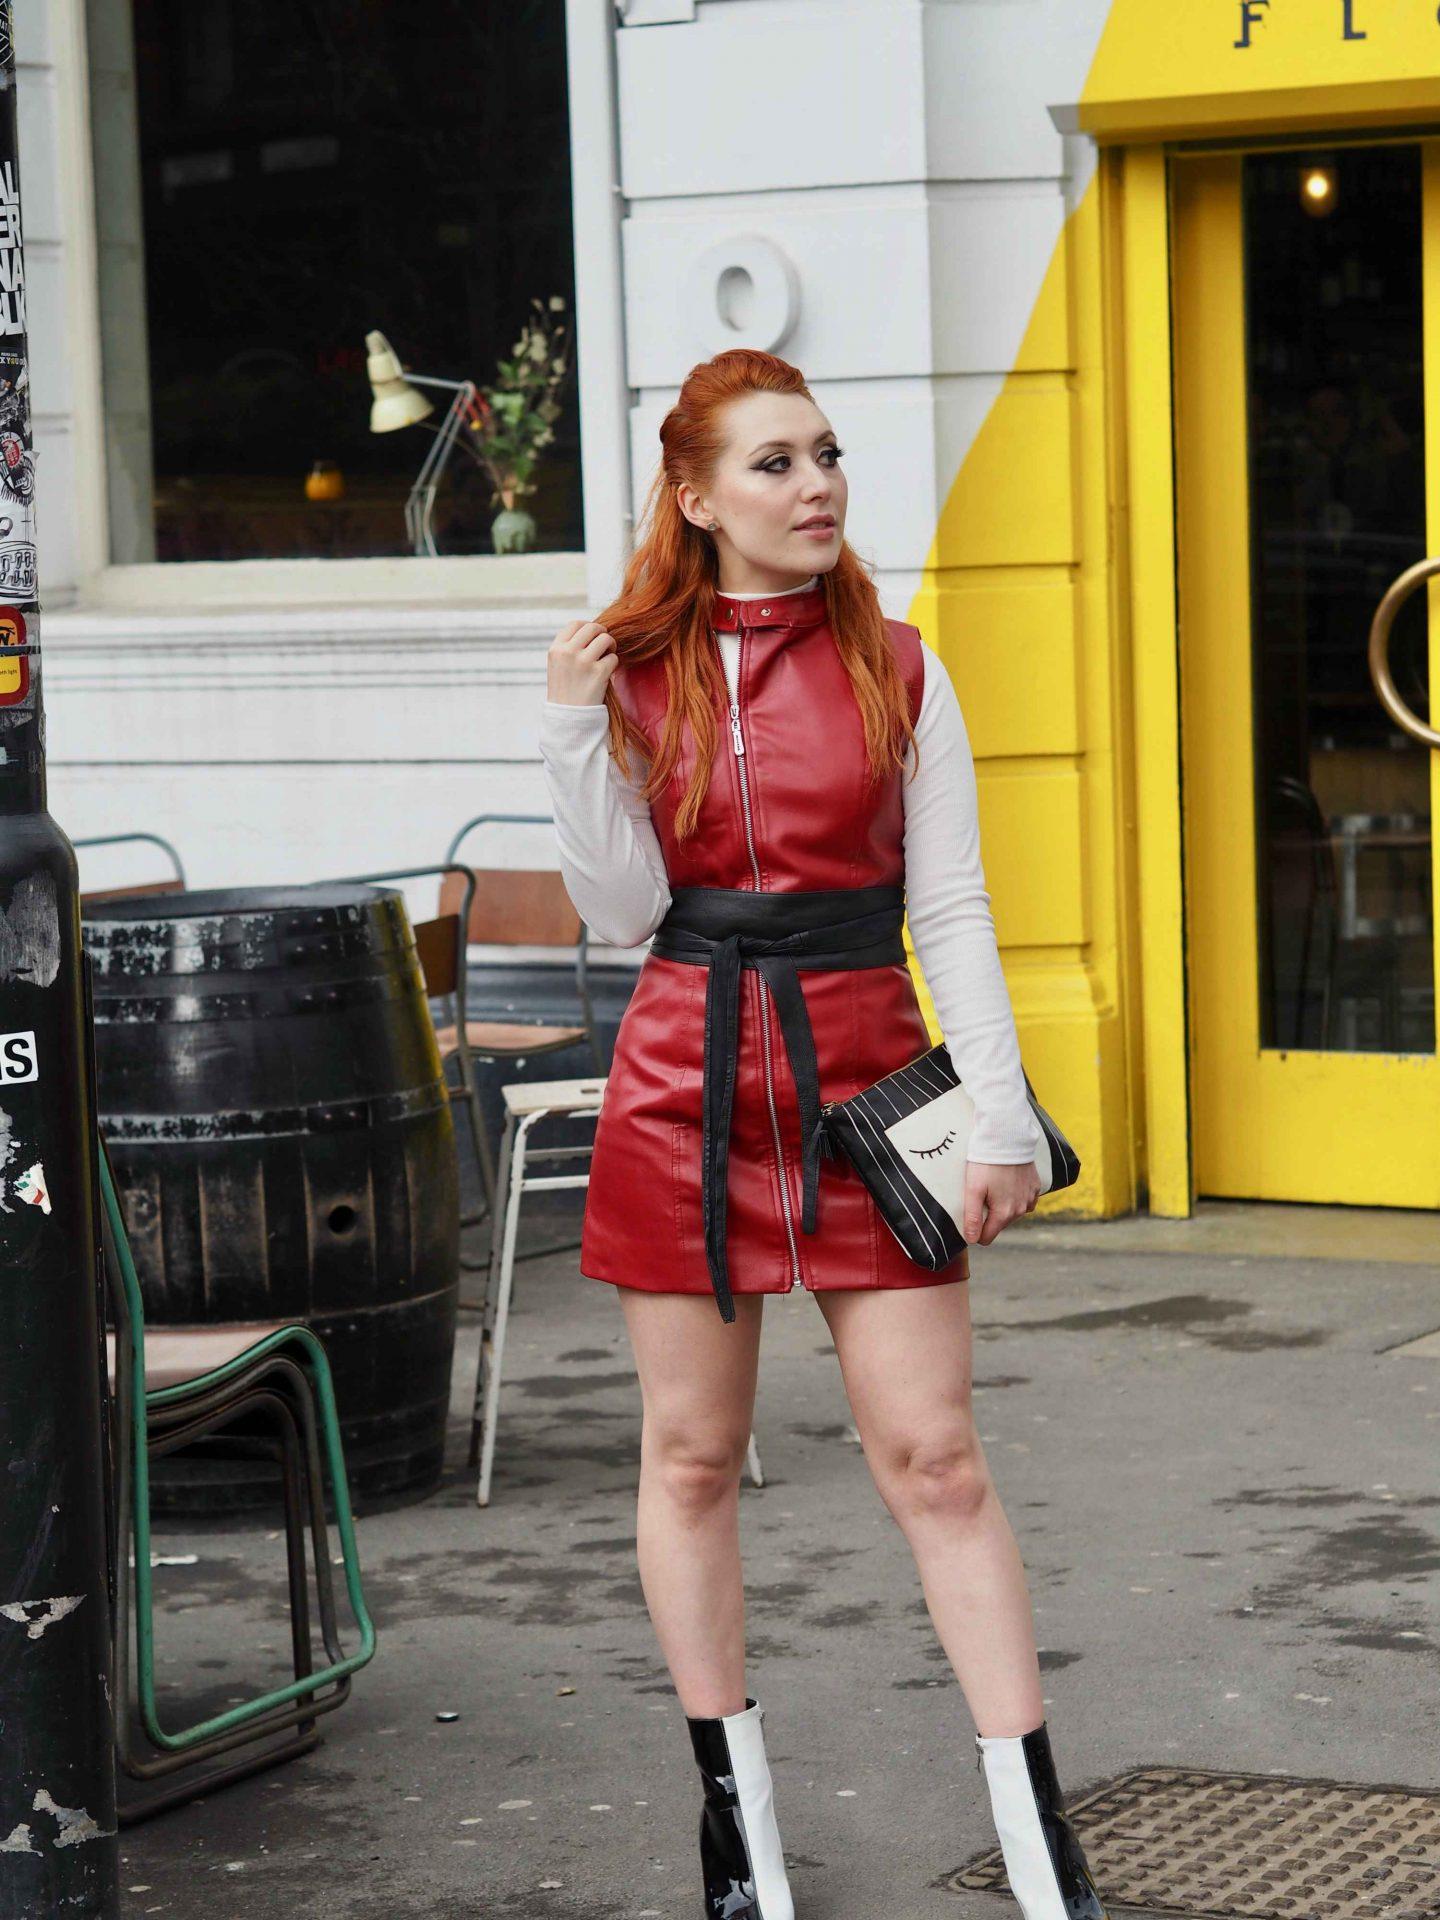 Blogger Twenty-Something City red leather biker dress street style Flok Manchester